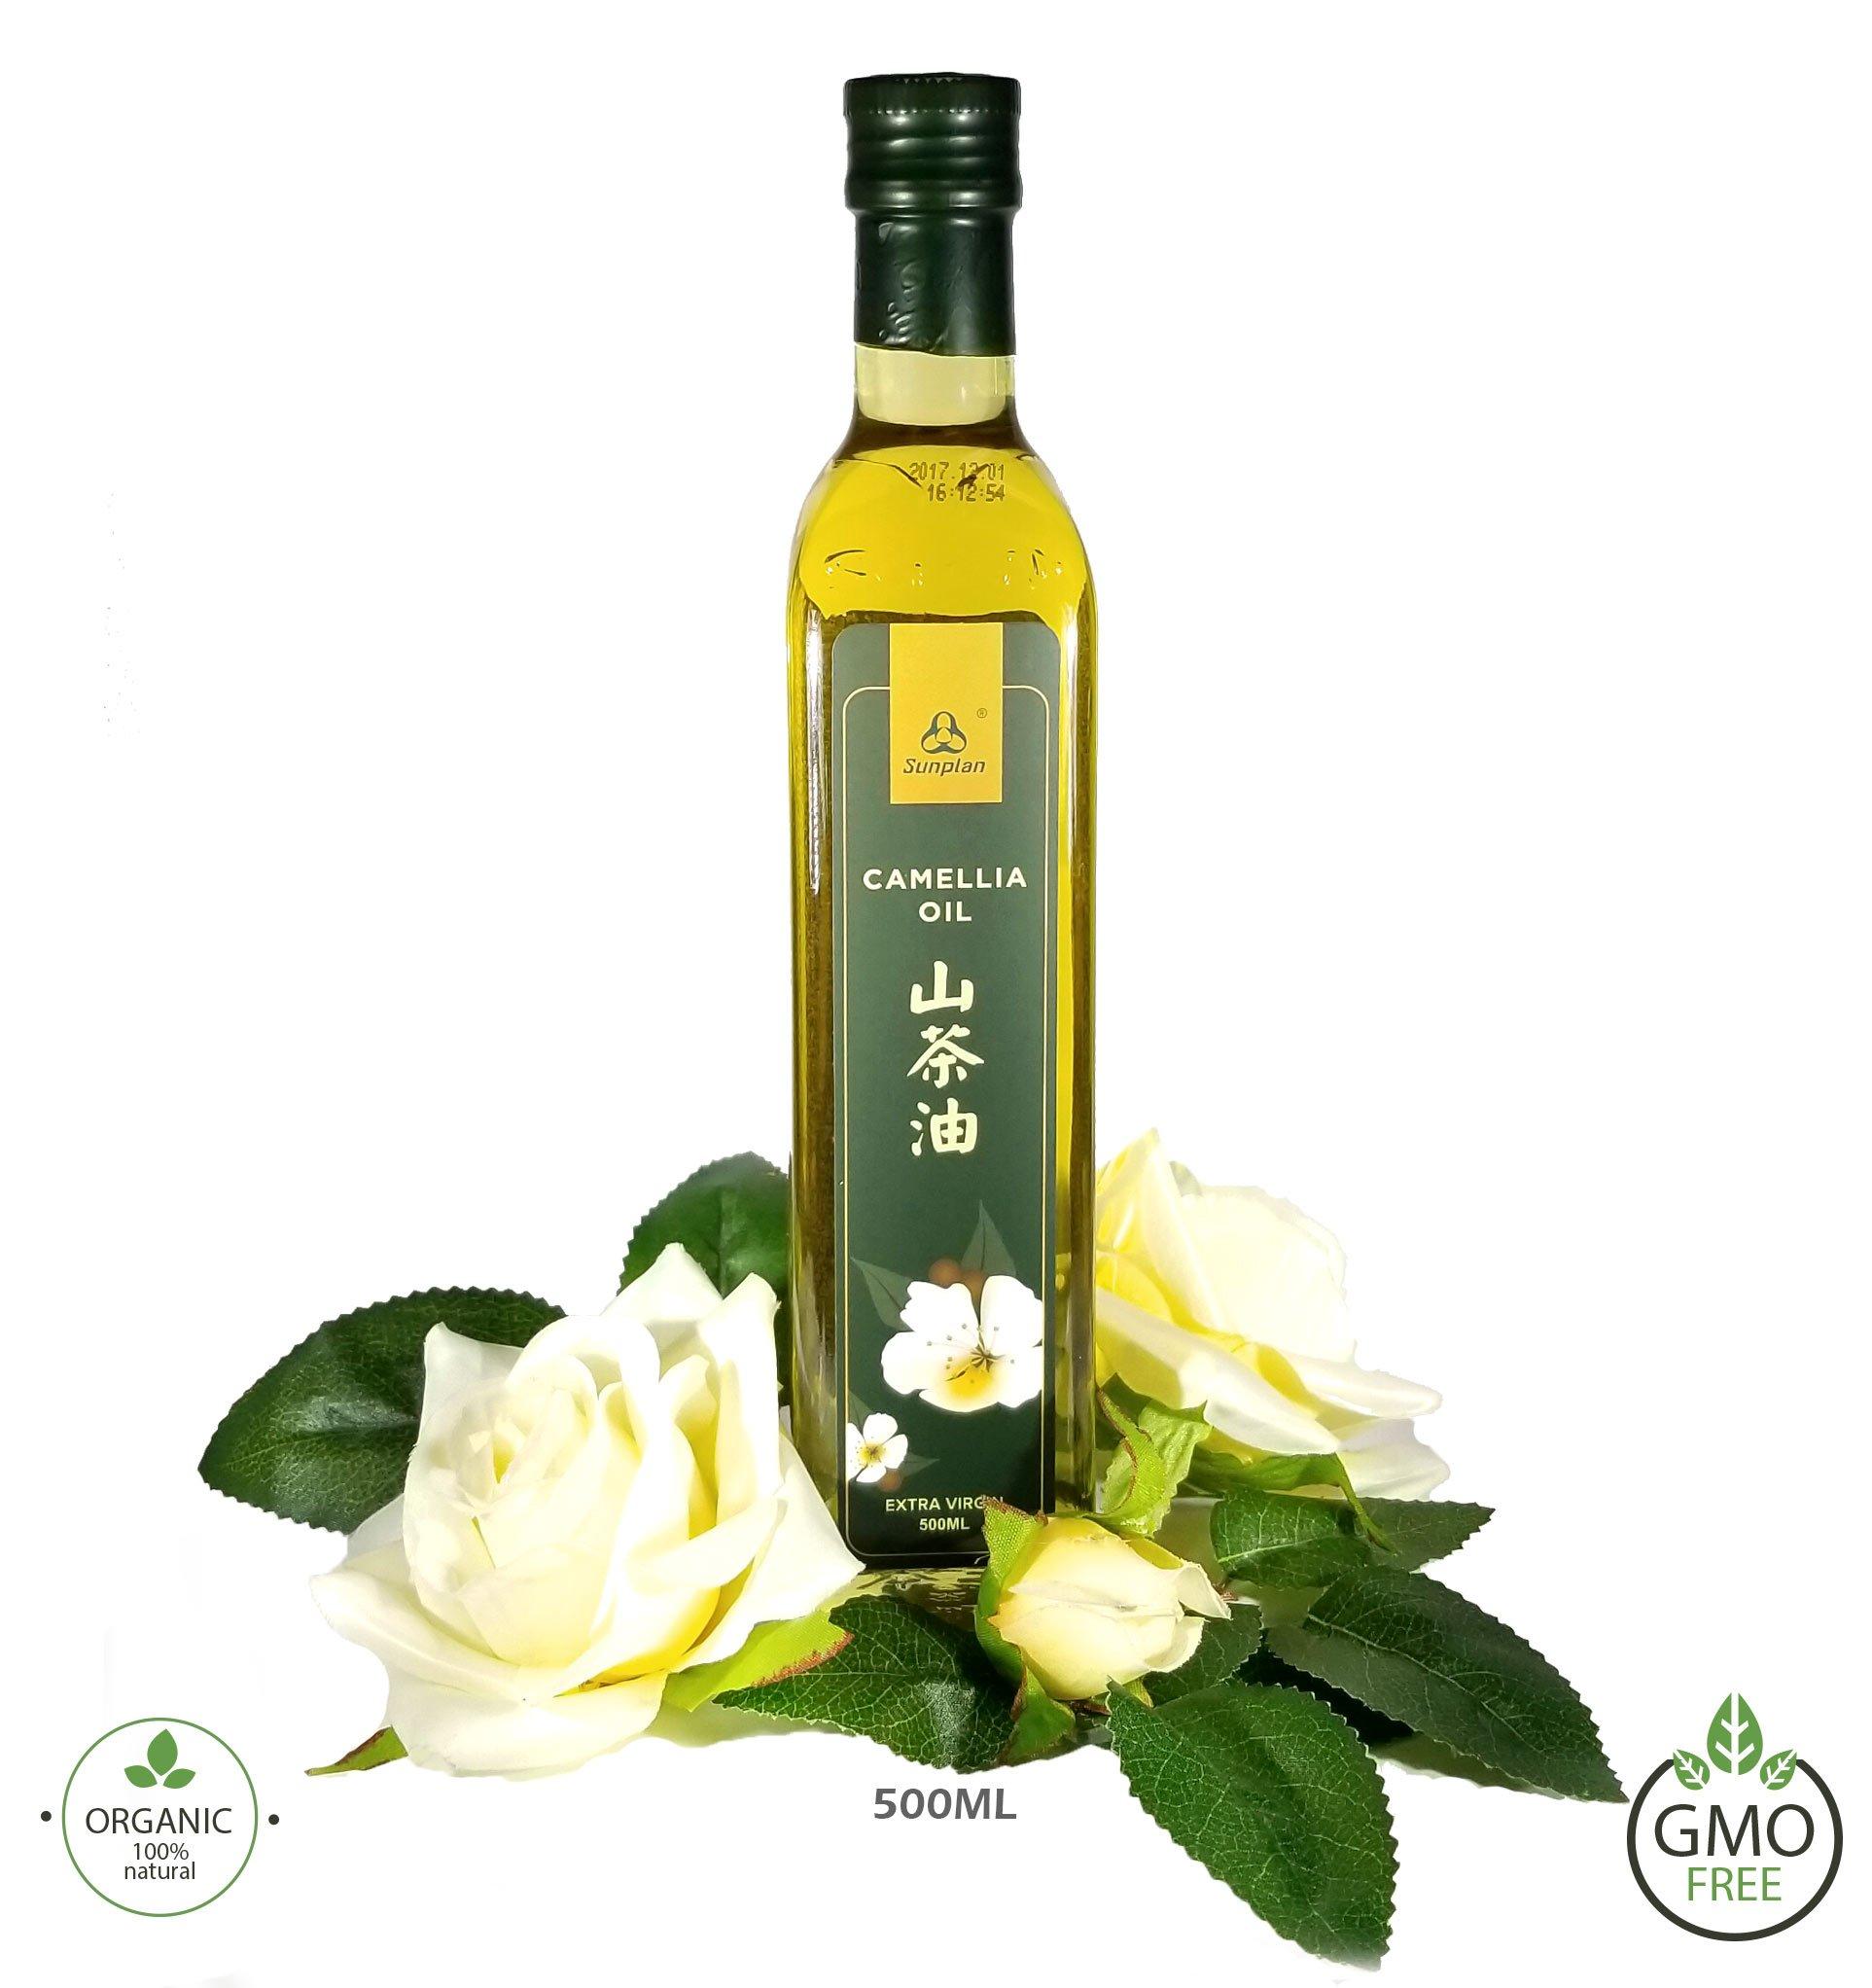 Sunplan Camellia Tea Seed Oil Organic Extra Virgin Cooking Oil (500ml / Bottle)